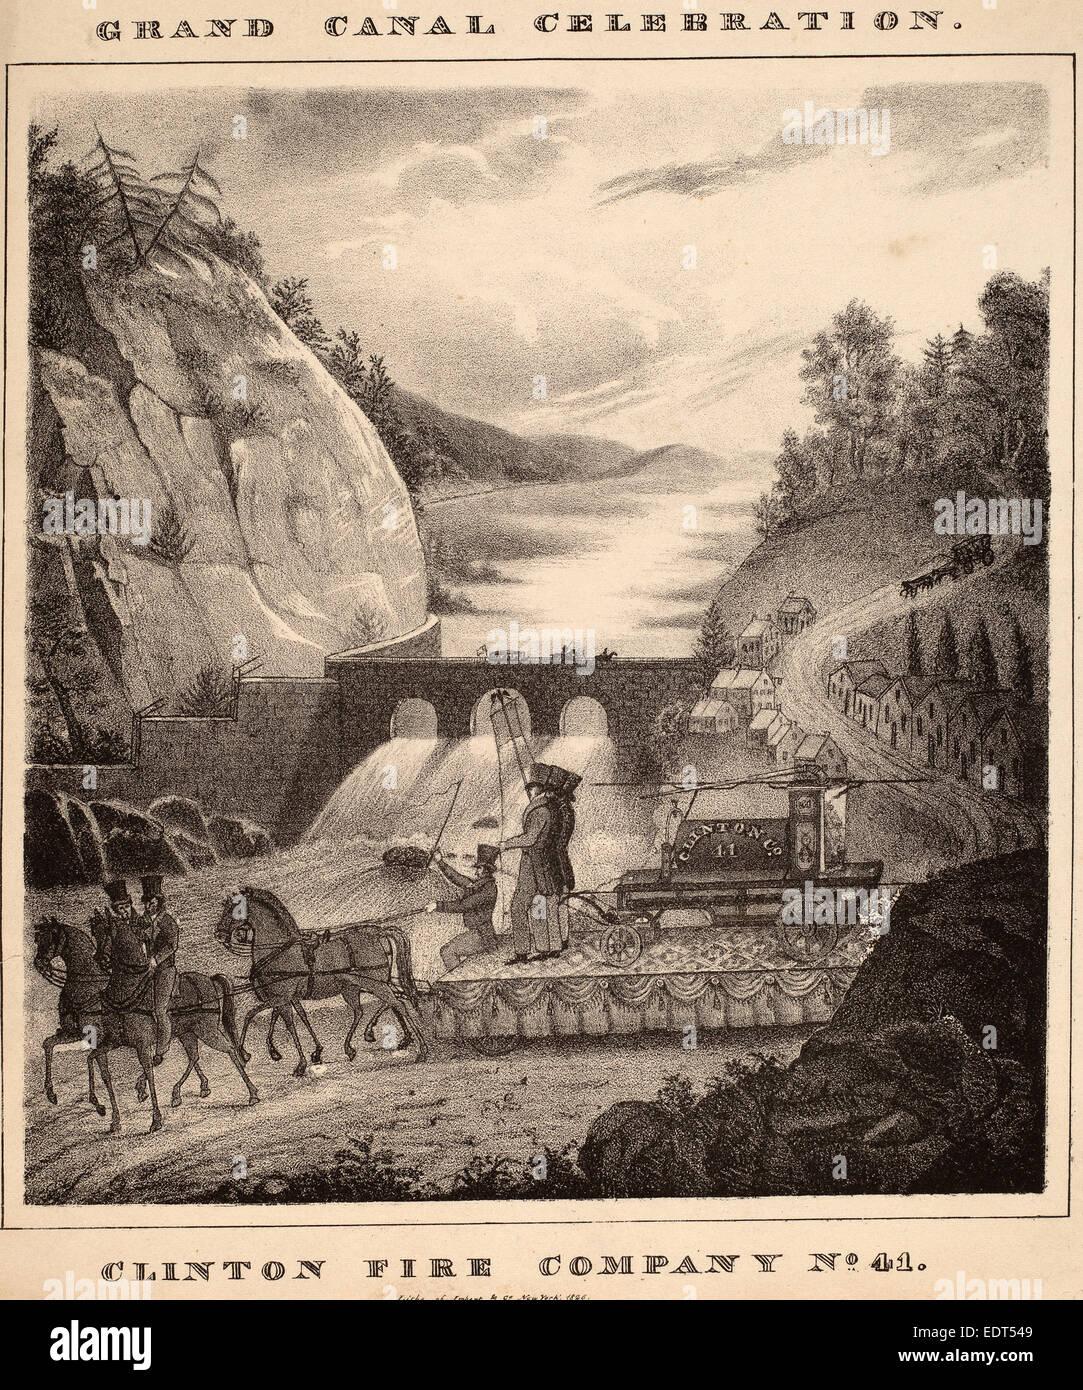 William H. Tuthill, Clinton Fire Company, Nr. 41, amerikanisch, 1826, Lithographie Stockbild